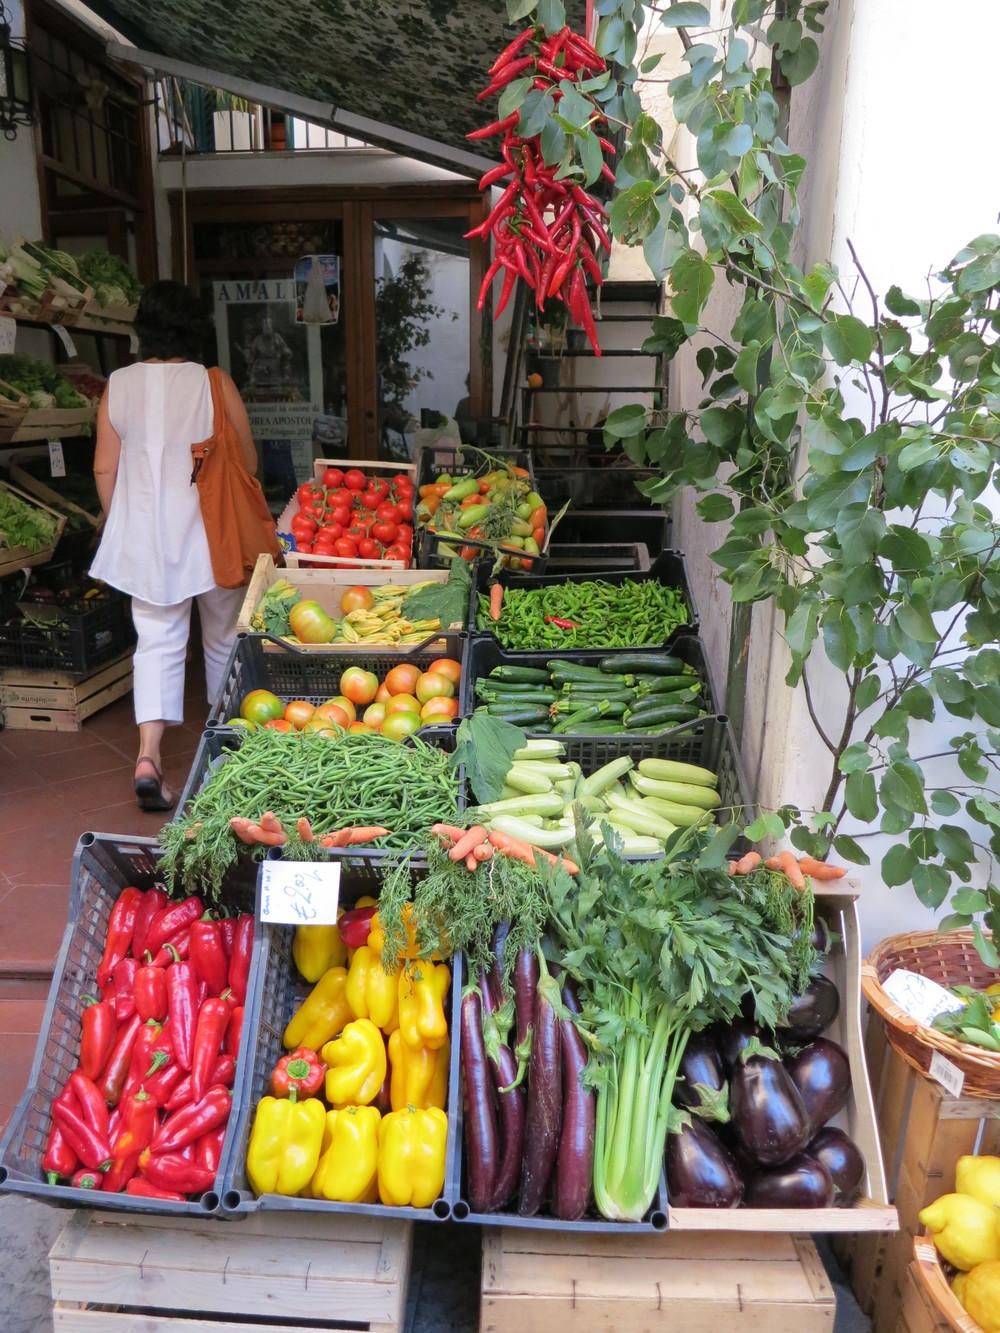 Produce market in Amalfi